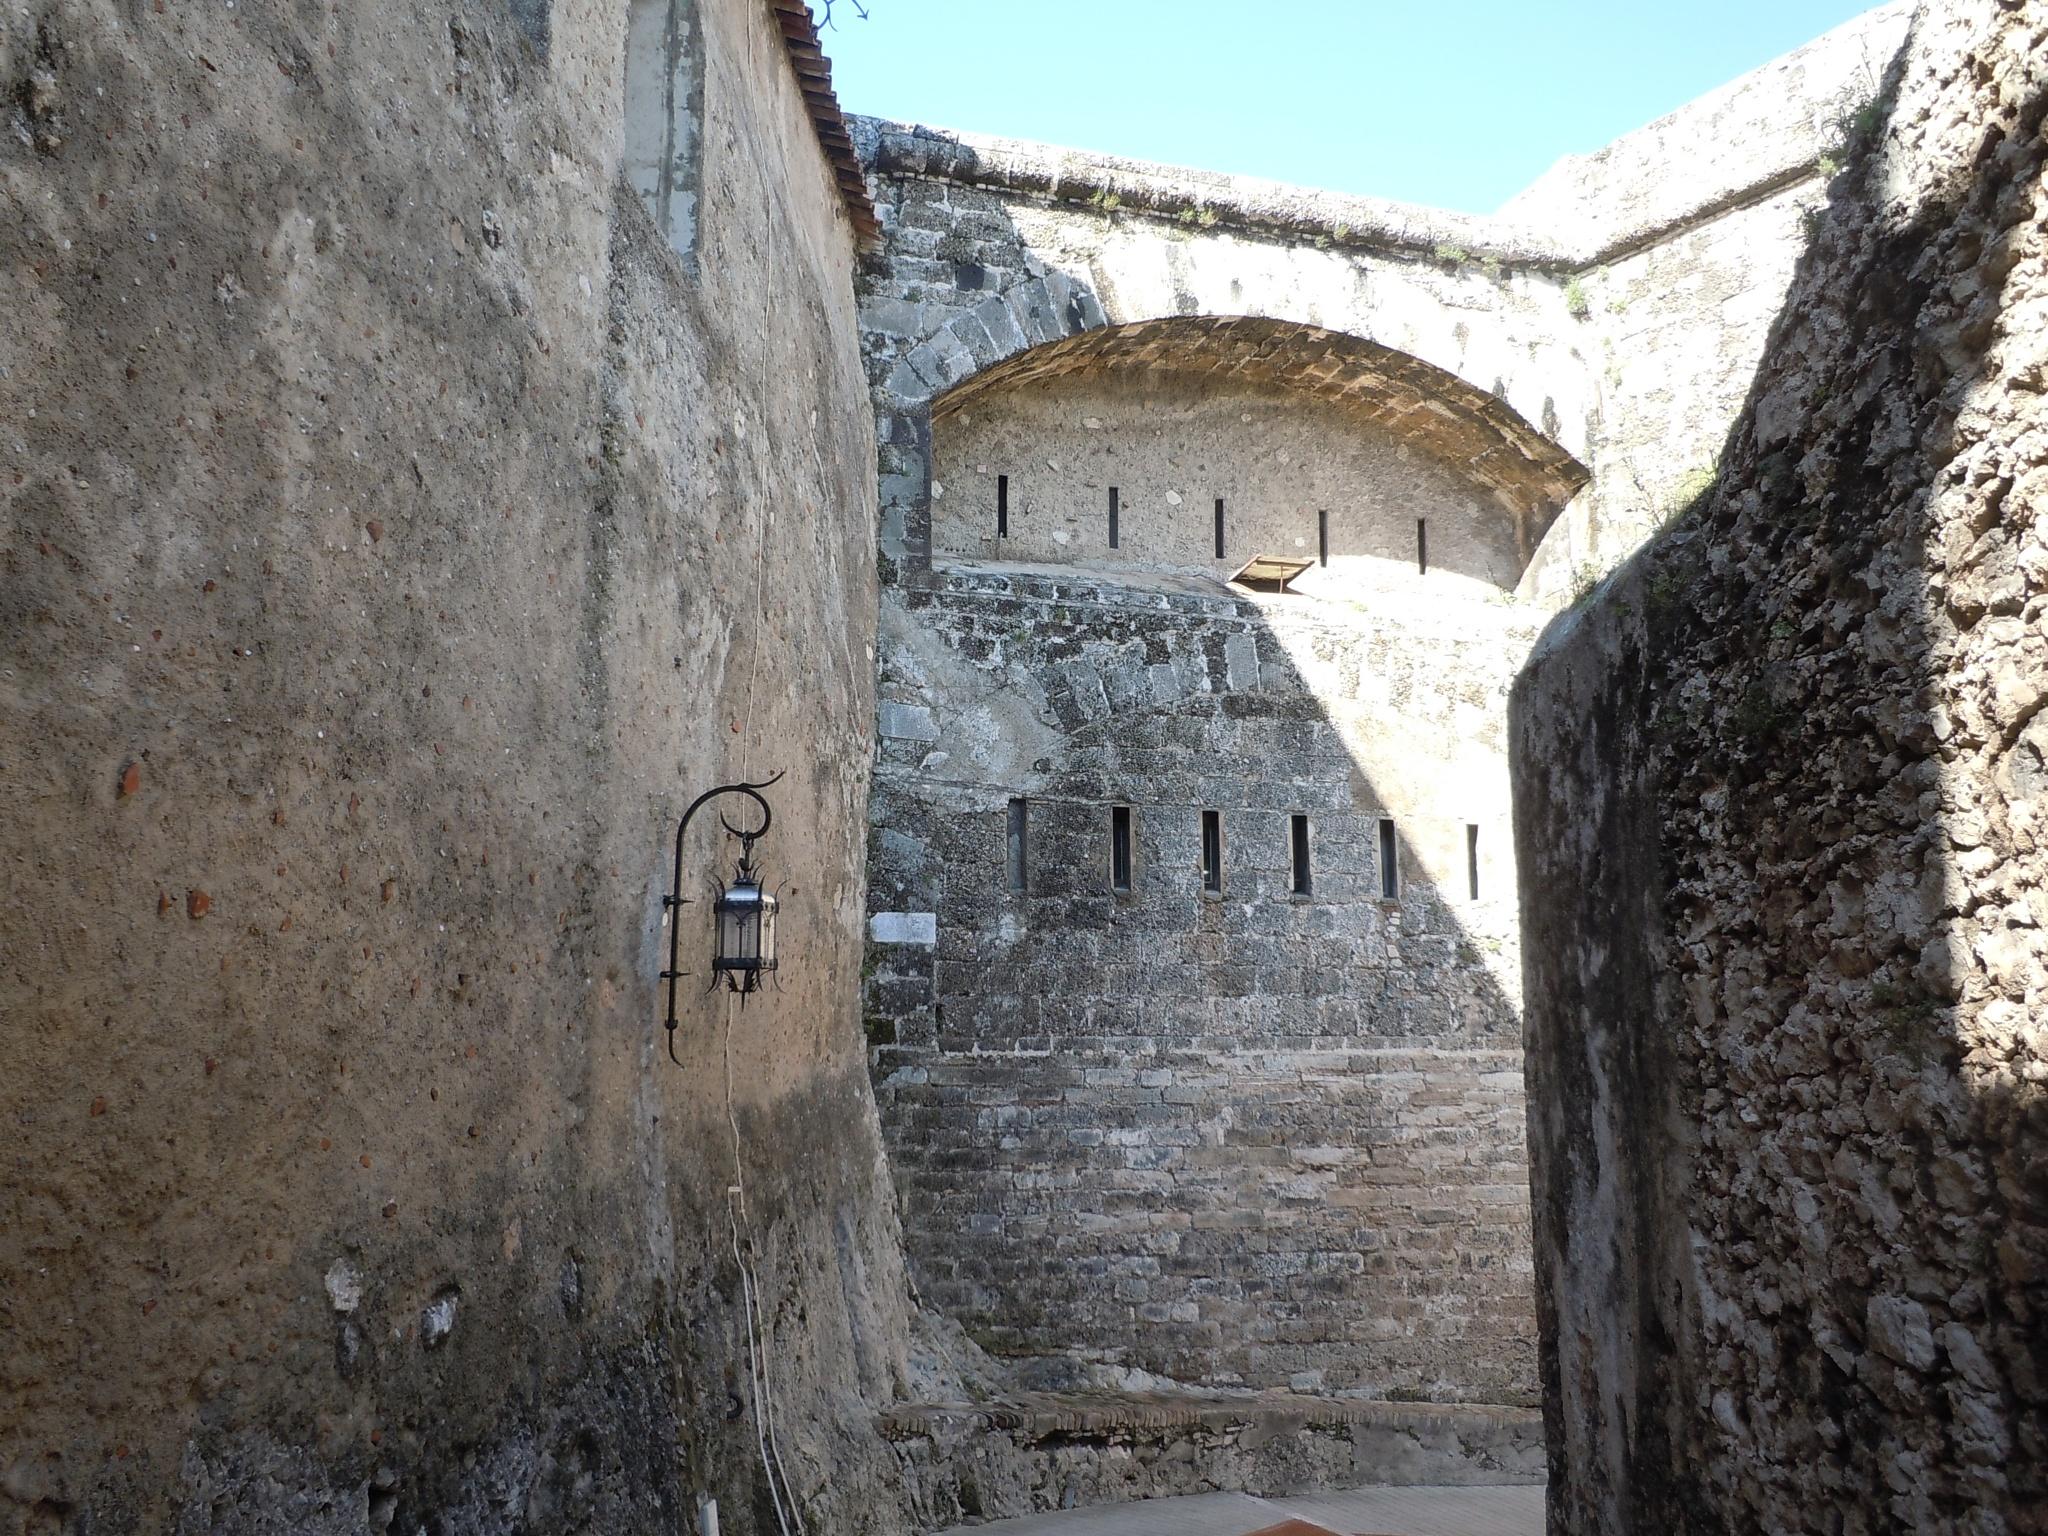 Fortress walls by F J Bering